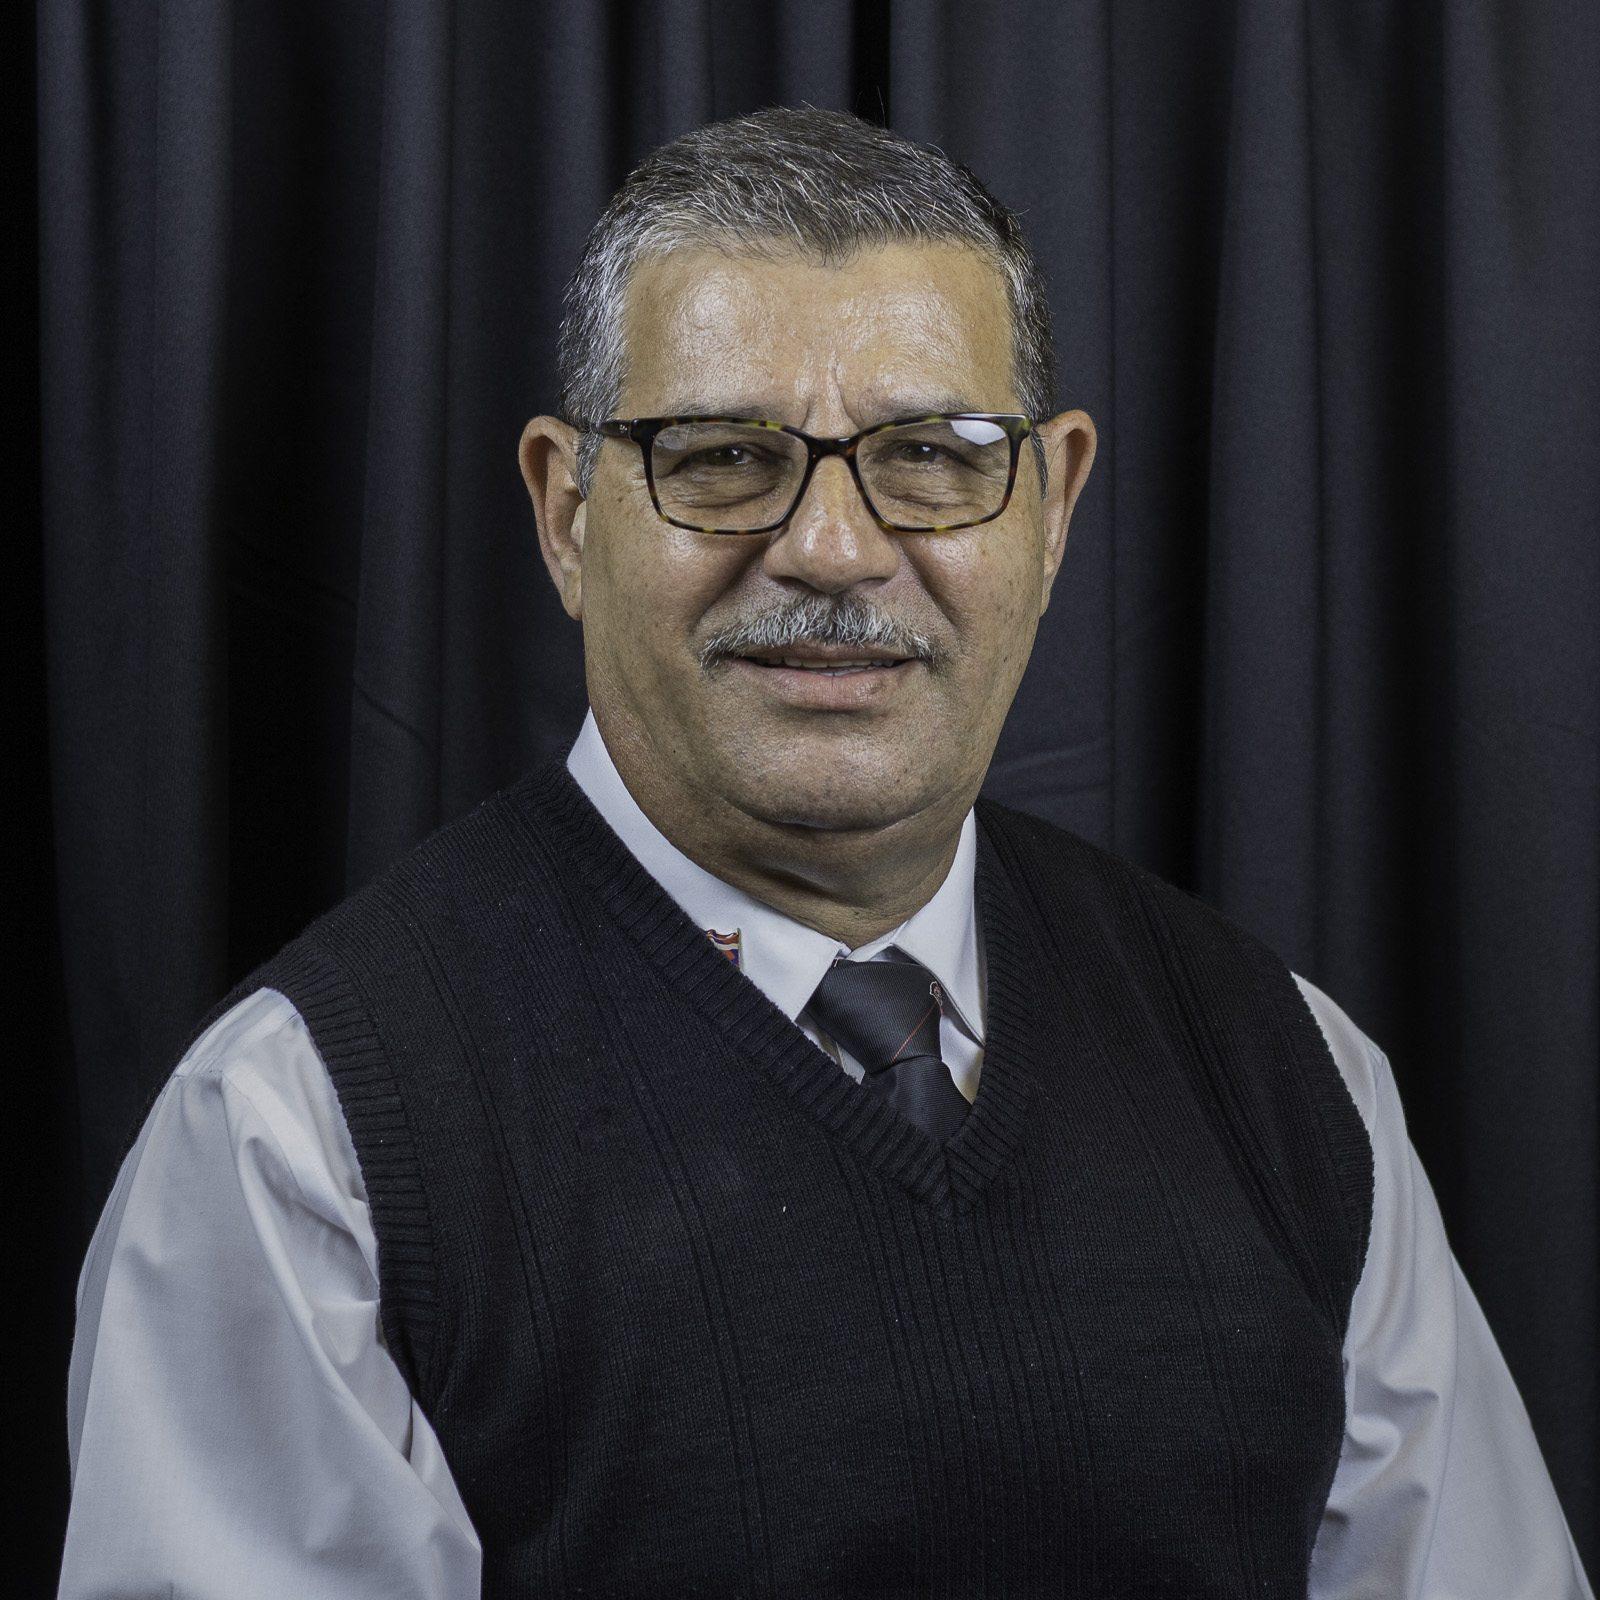 Luis Zeledon Gadea